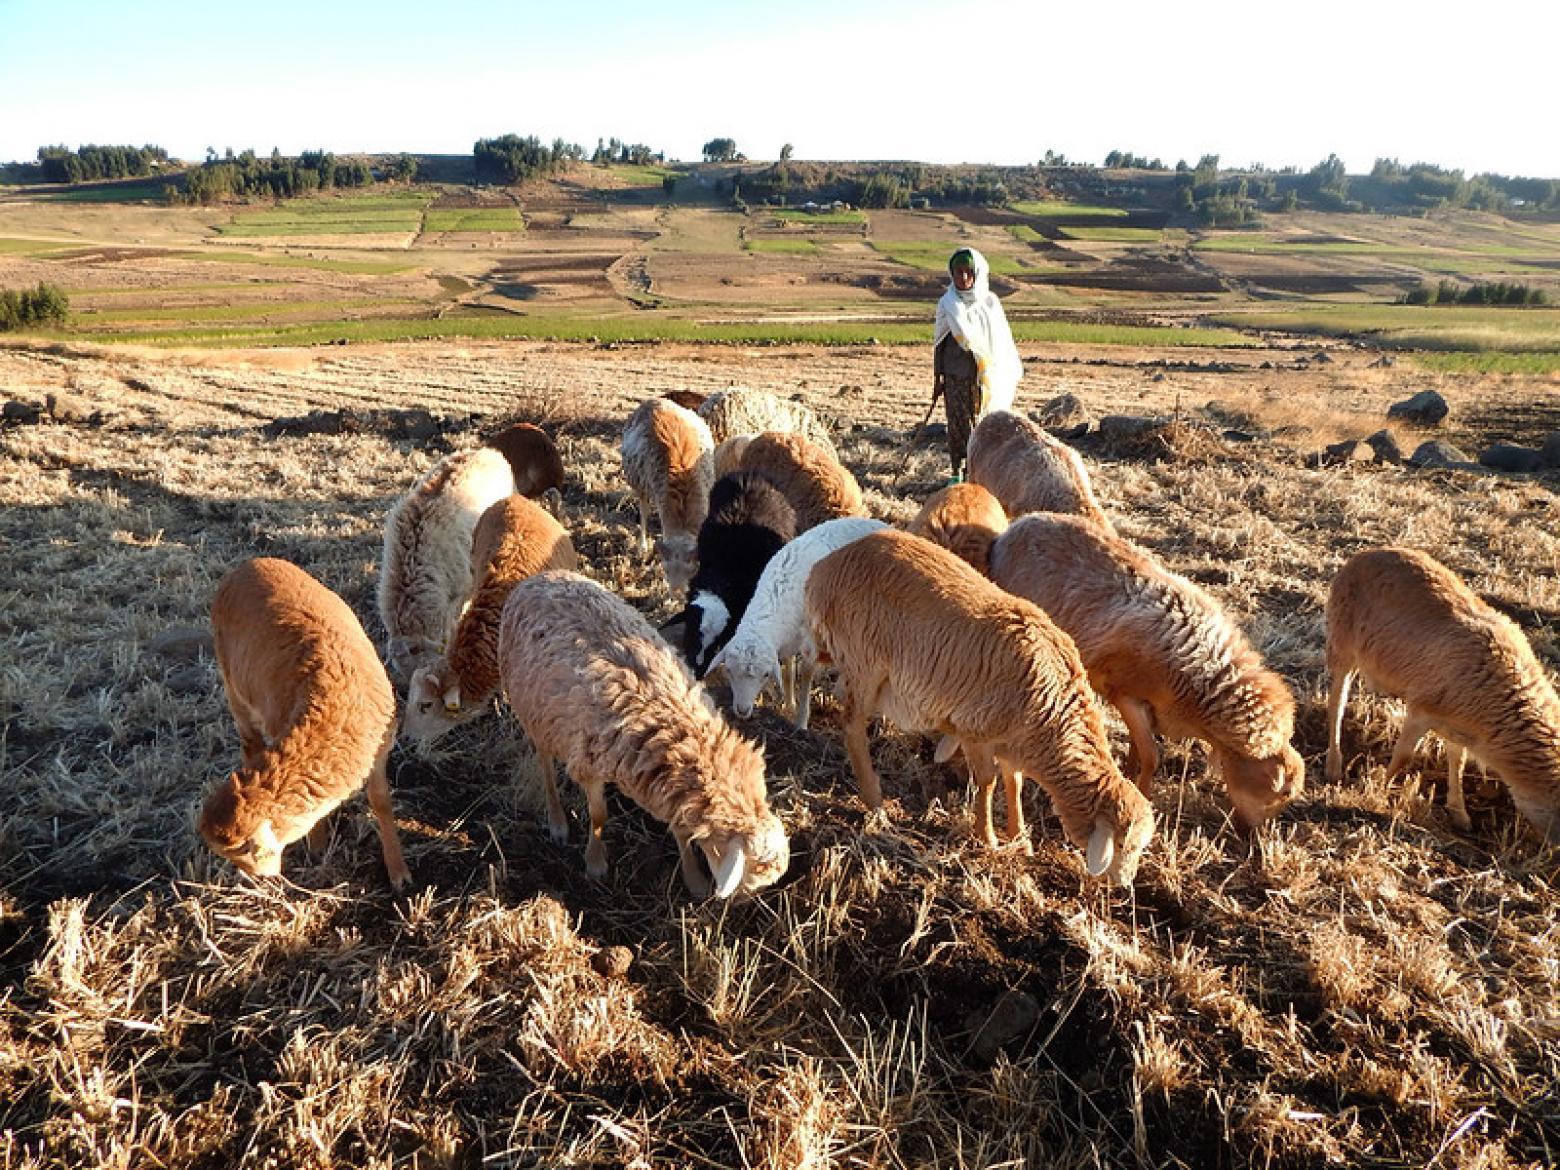 Picture taken by Tesfaye Getachew Mengistu, ICARDA.